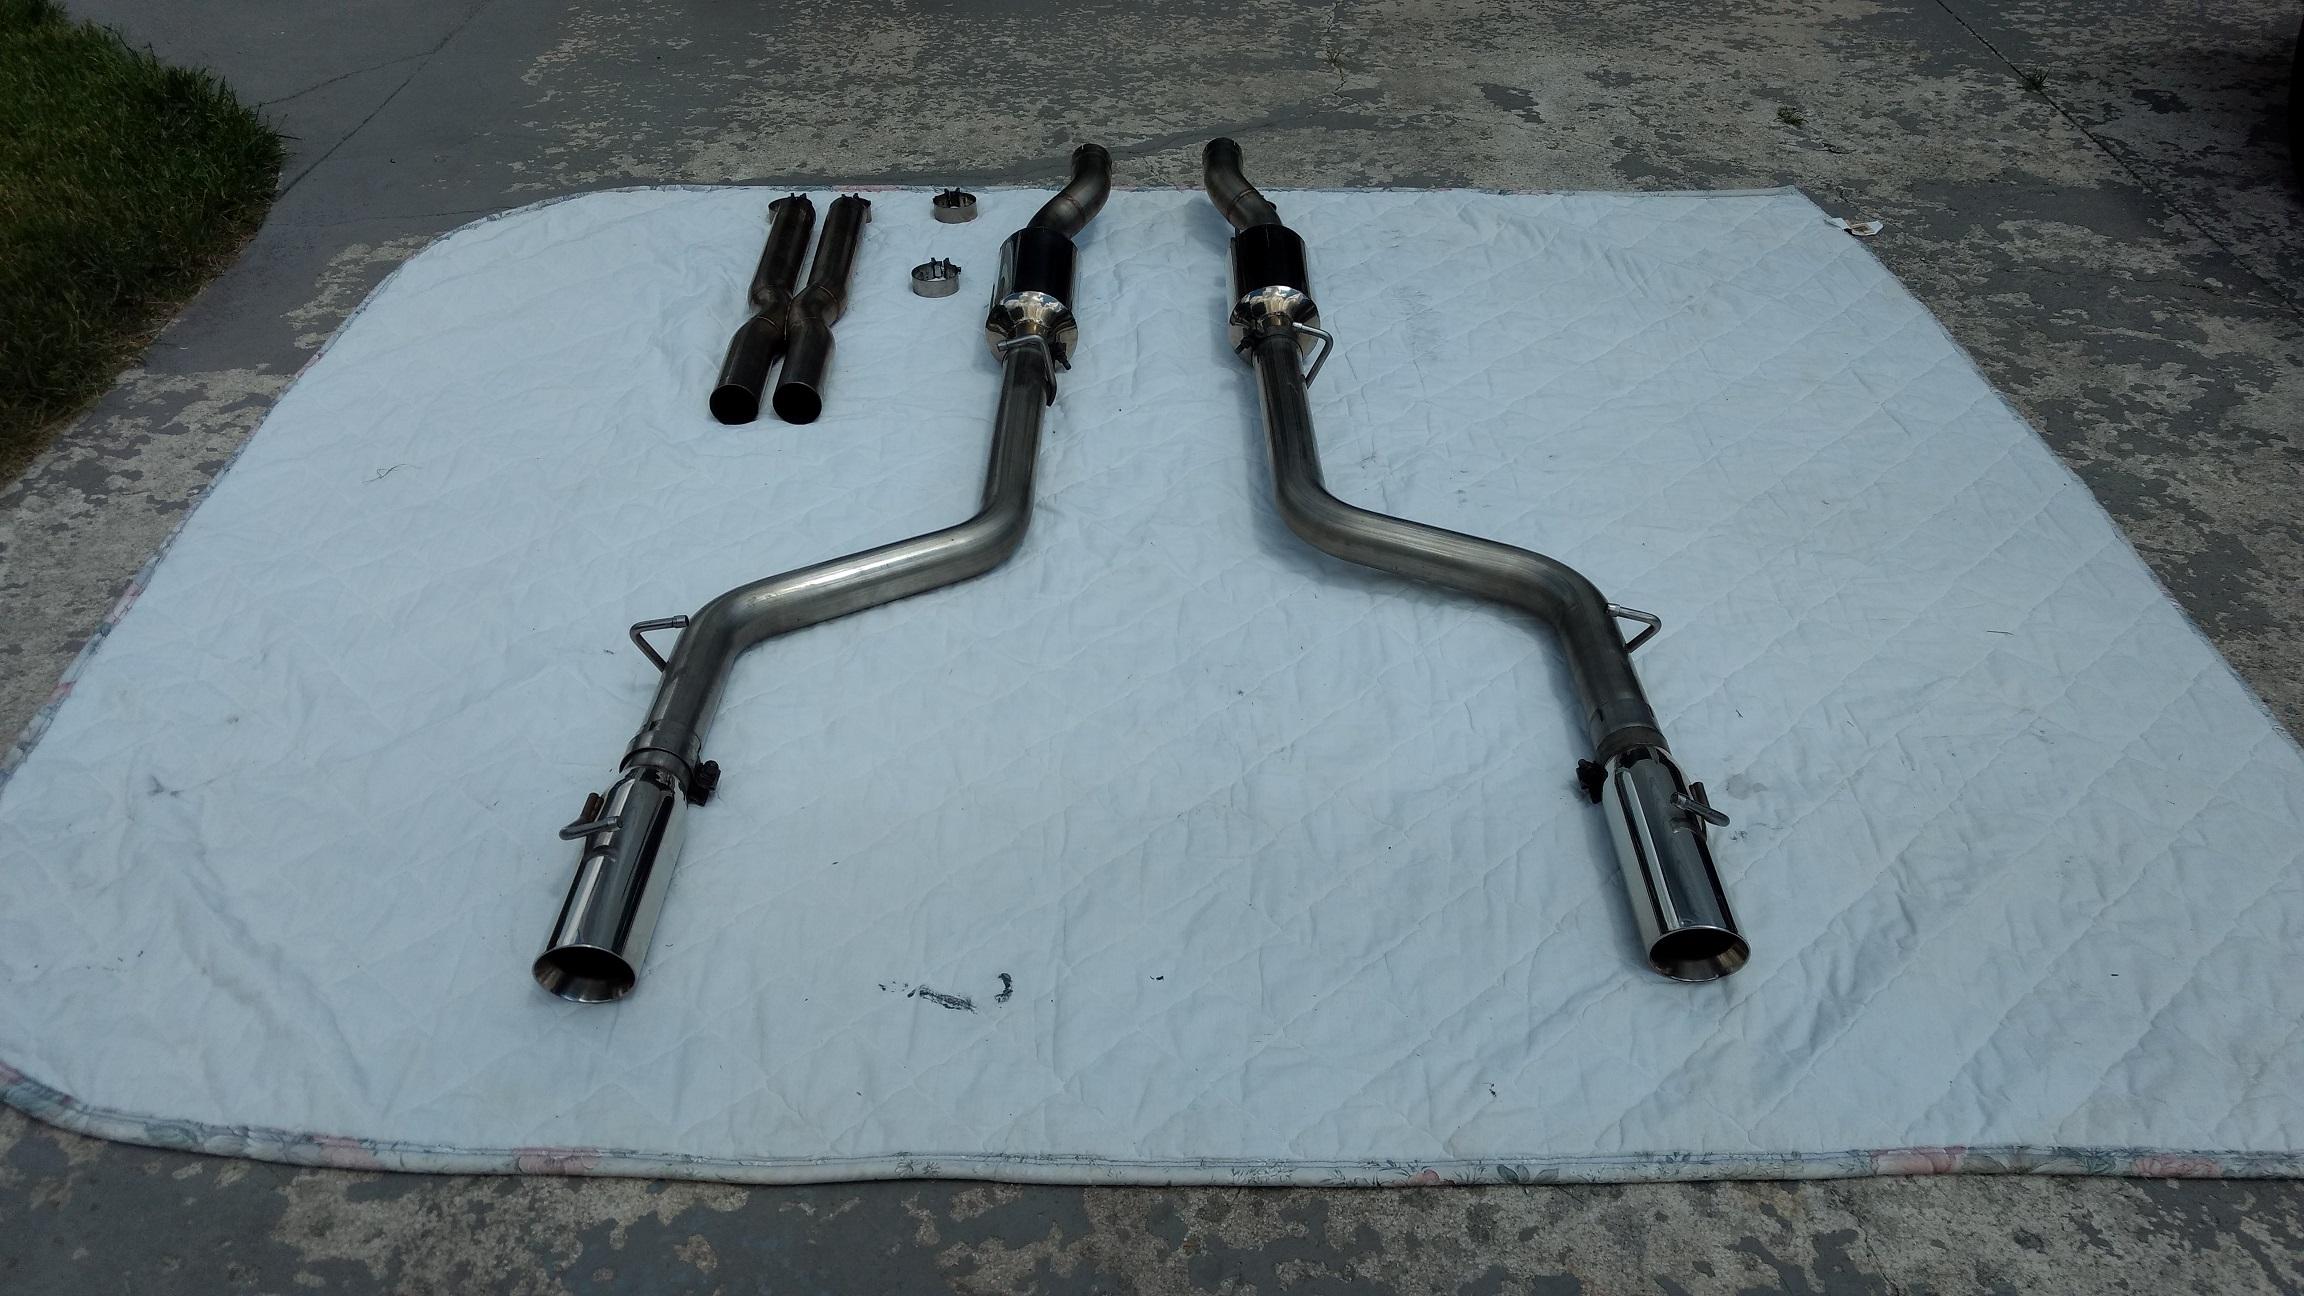 Zoomers Exhaust For Sale - 2005-2010 SRT8 / 6.1L Hemi